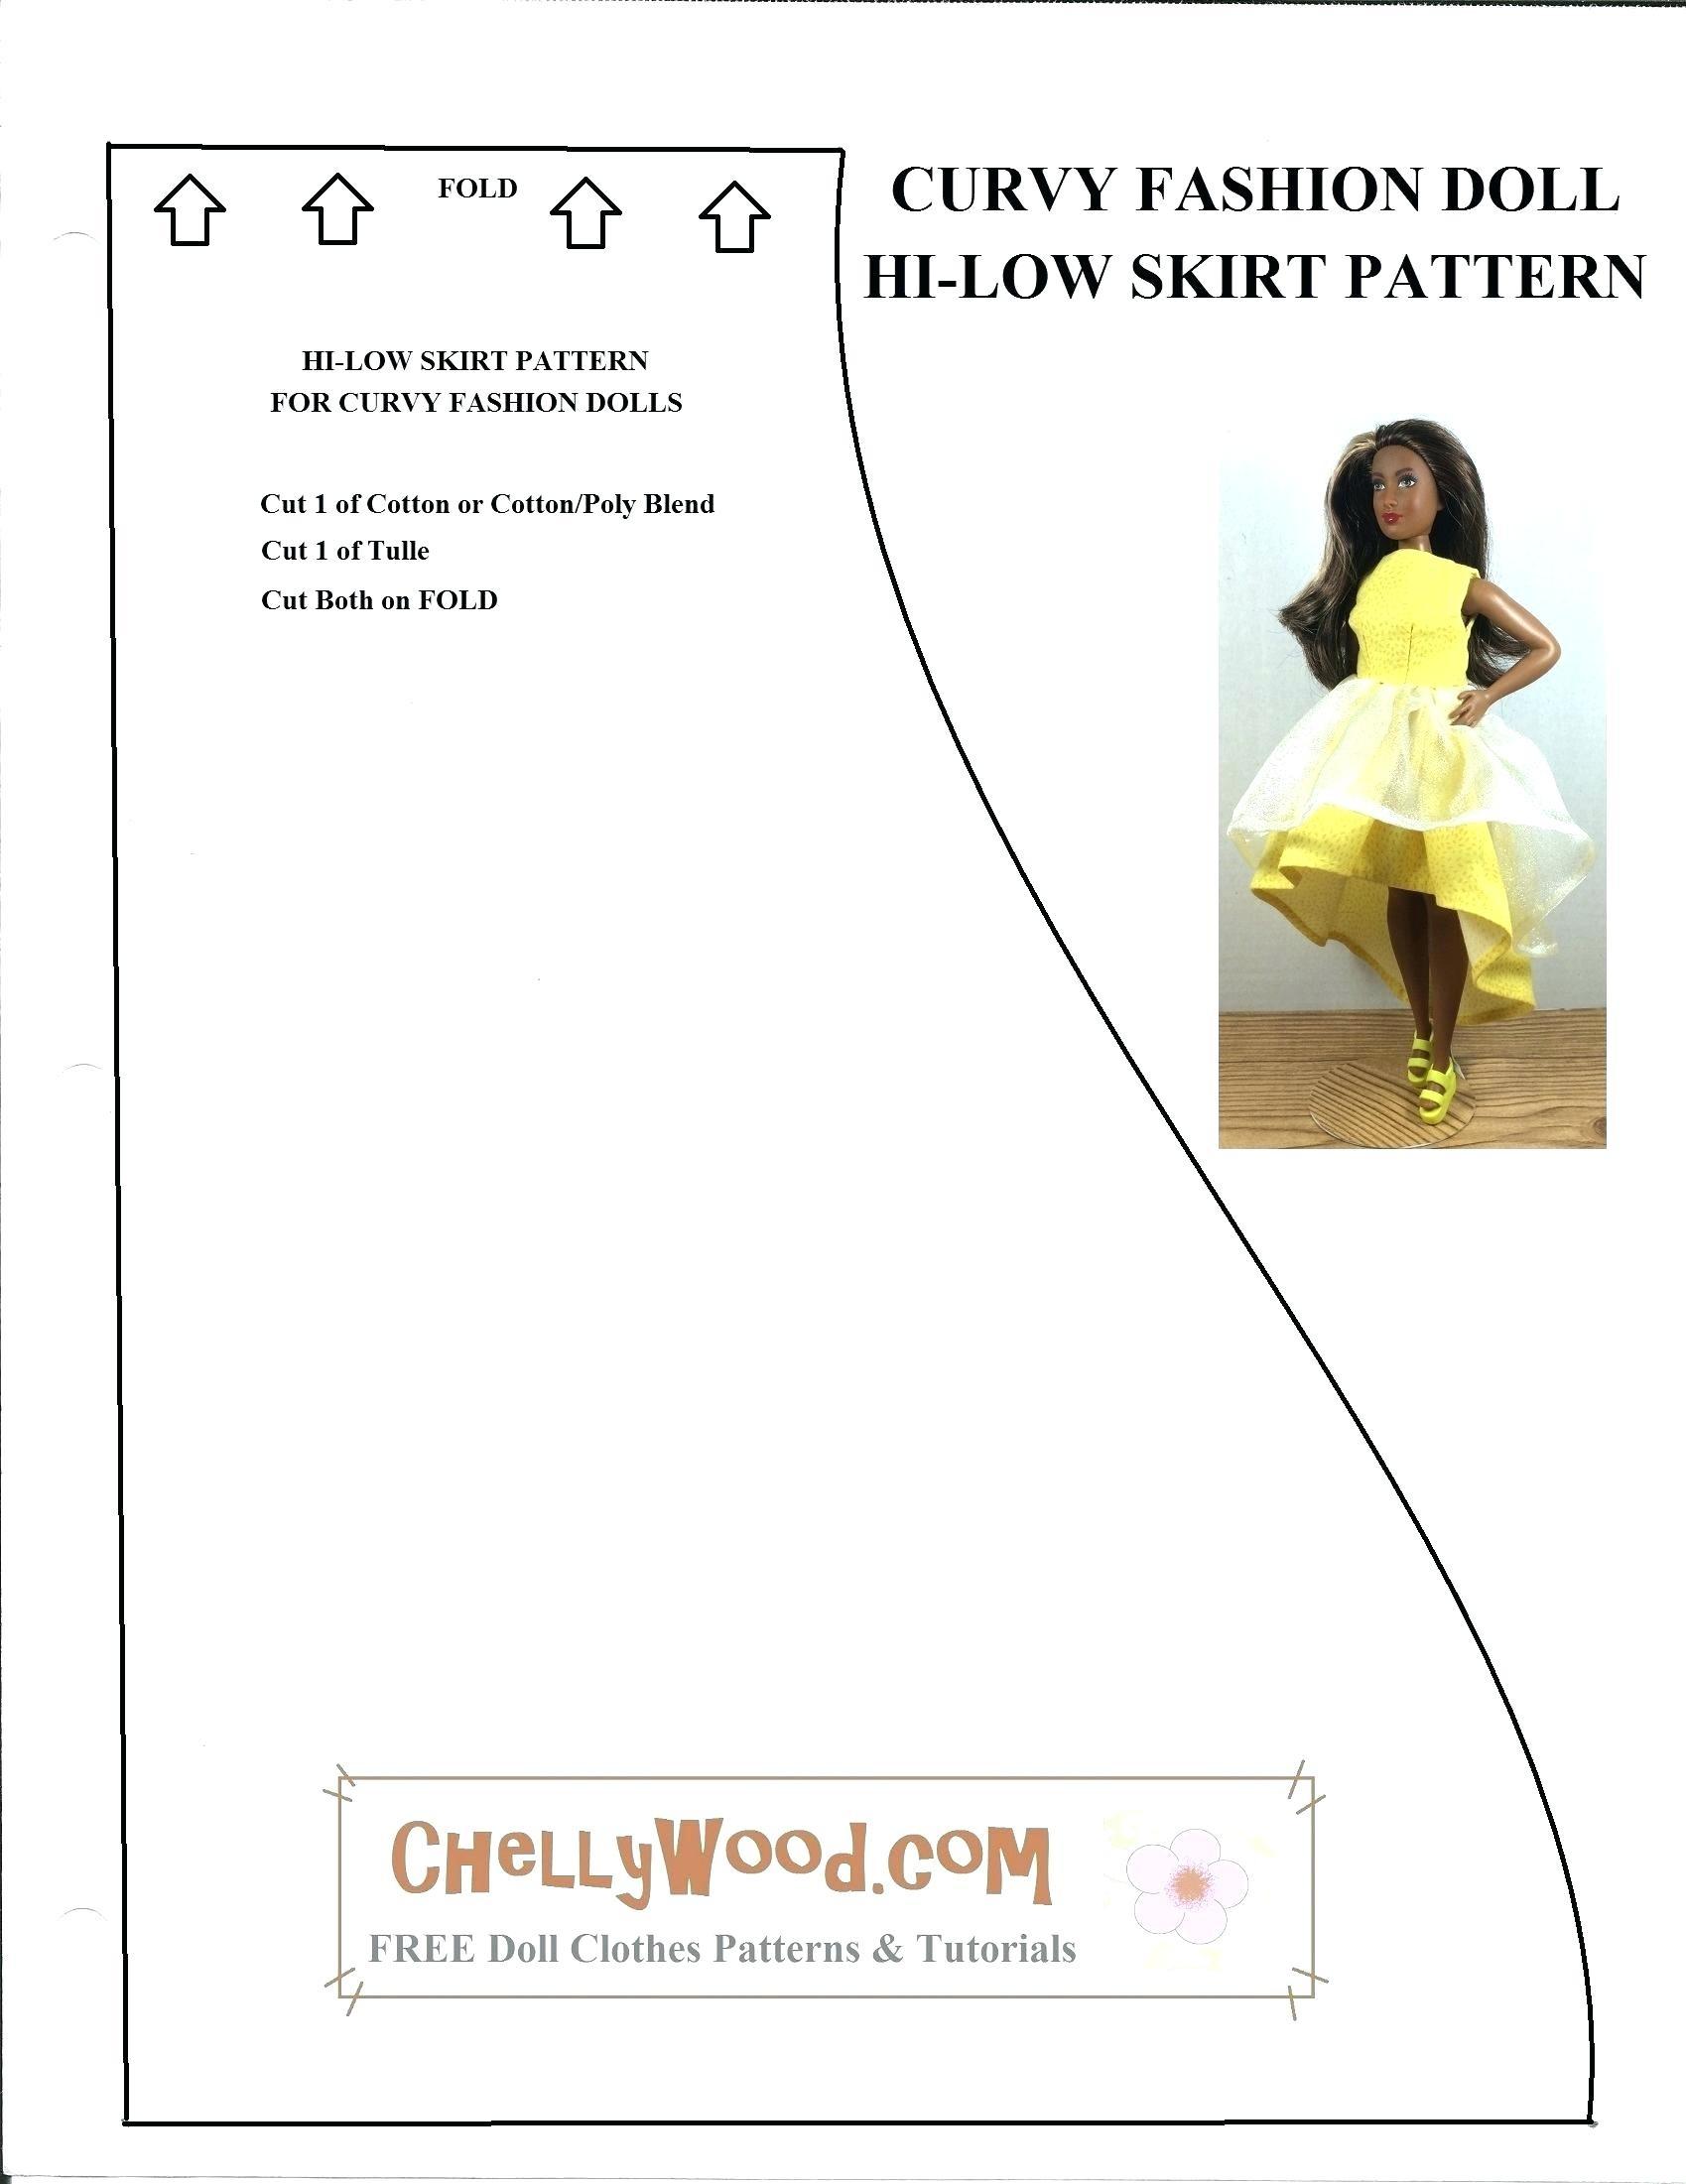 Barbie Dress Patterns Free Printable Pdf   Saddha - Free Printable Sewing Patterns Pdf